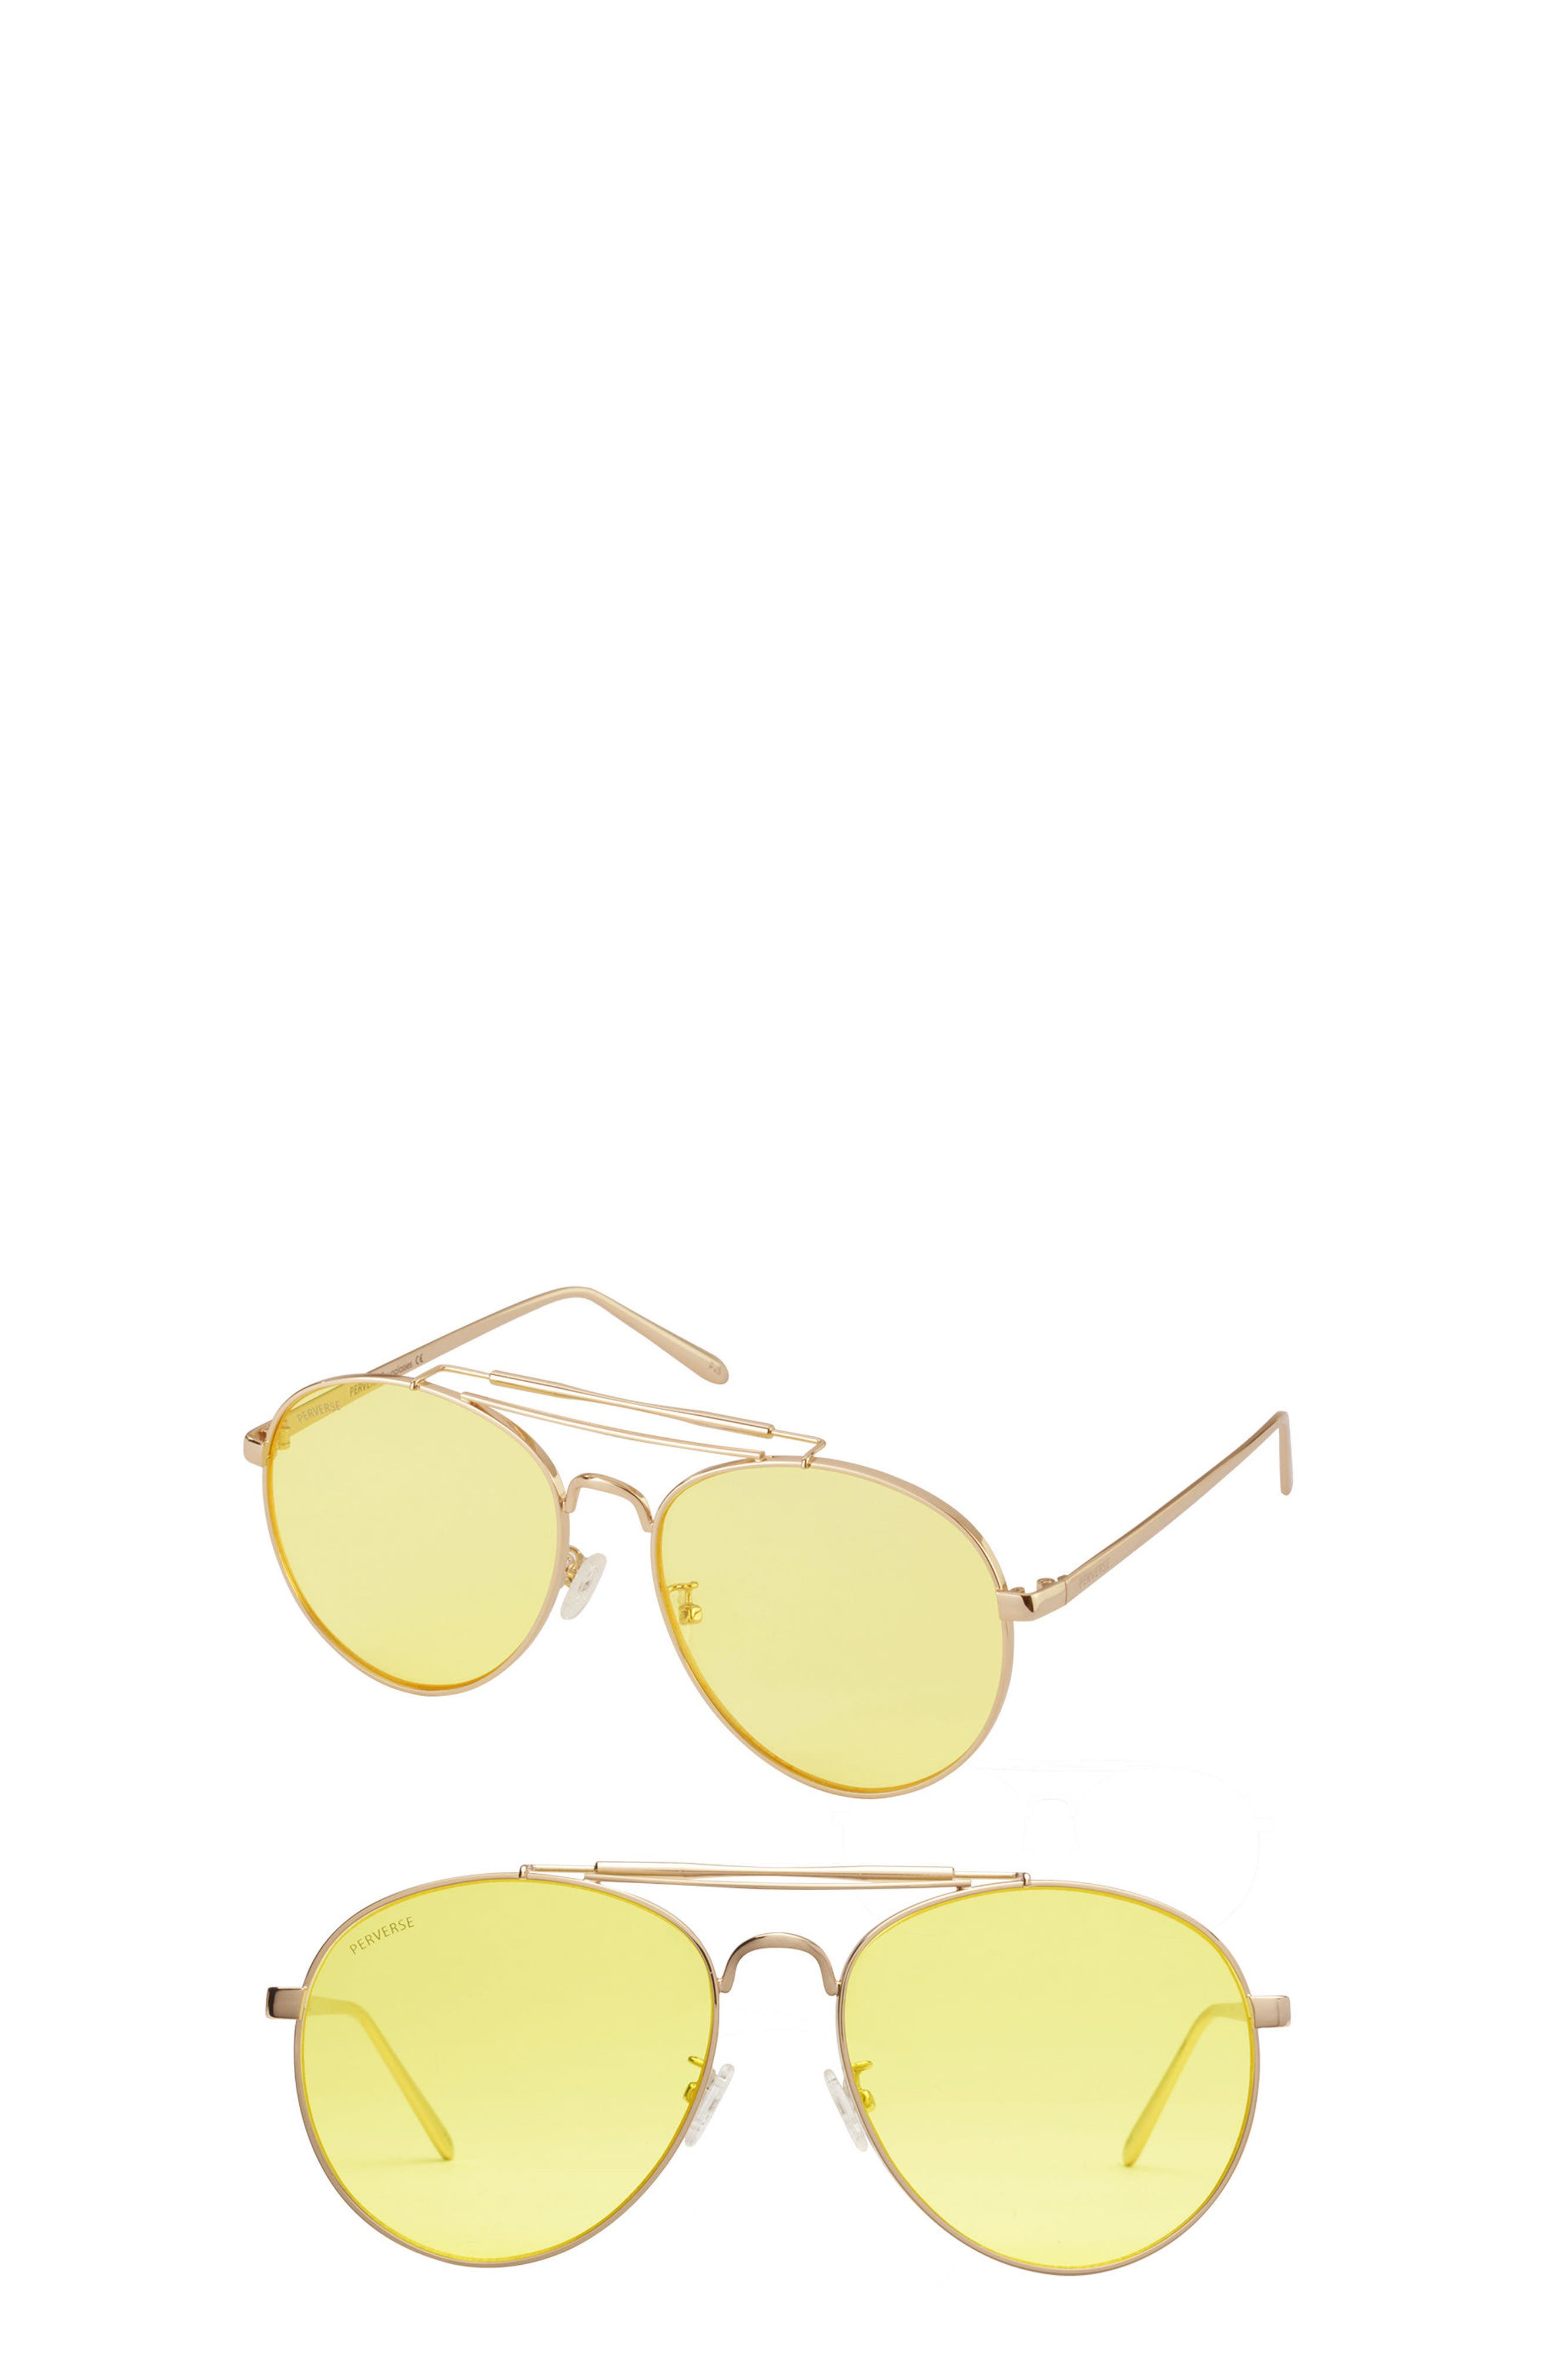 Crisp Aviator Sunglasses,                             Main thumbnail 1, color,                             Yellow/ Gold